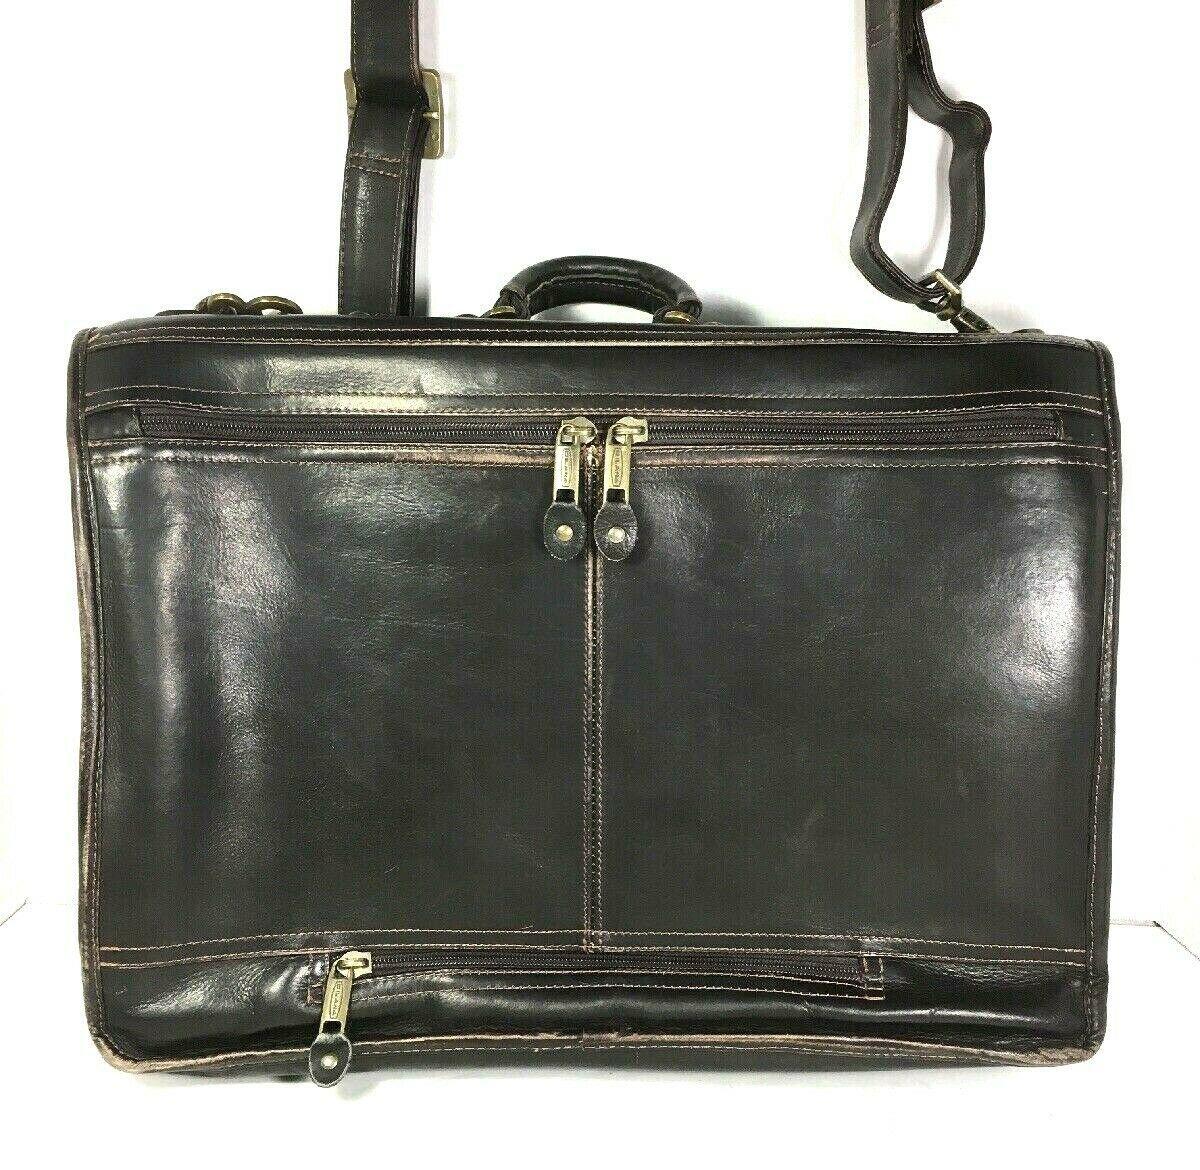 Santa Fe Dilana Vintage Dark Brown Leather Briefcase Laptop Bag – Distressed